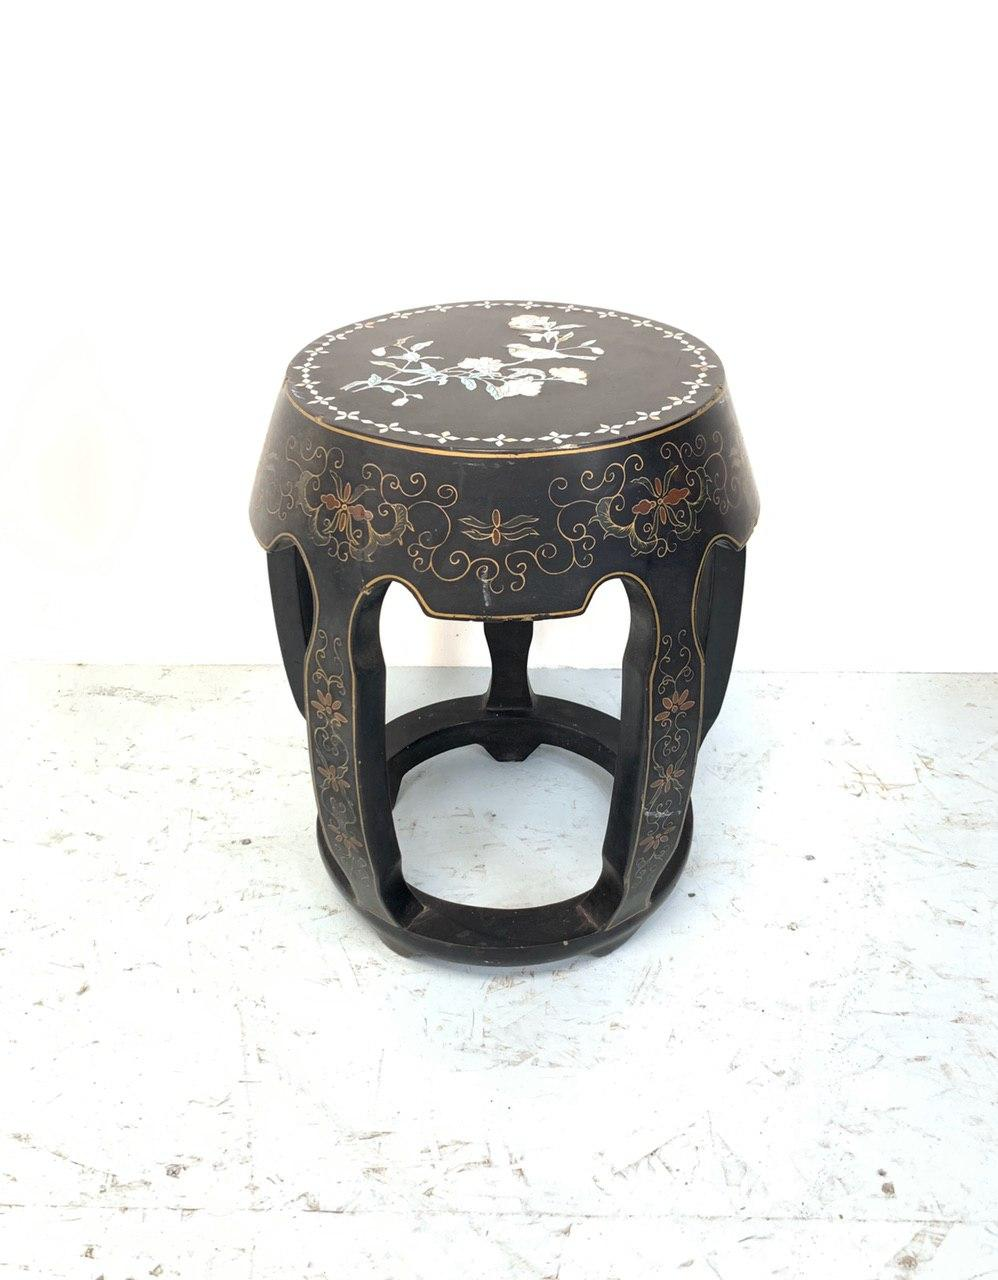 Винтажный табурет в стиле Шинуазри